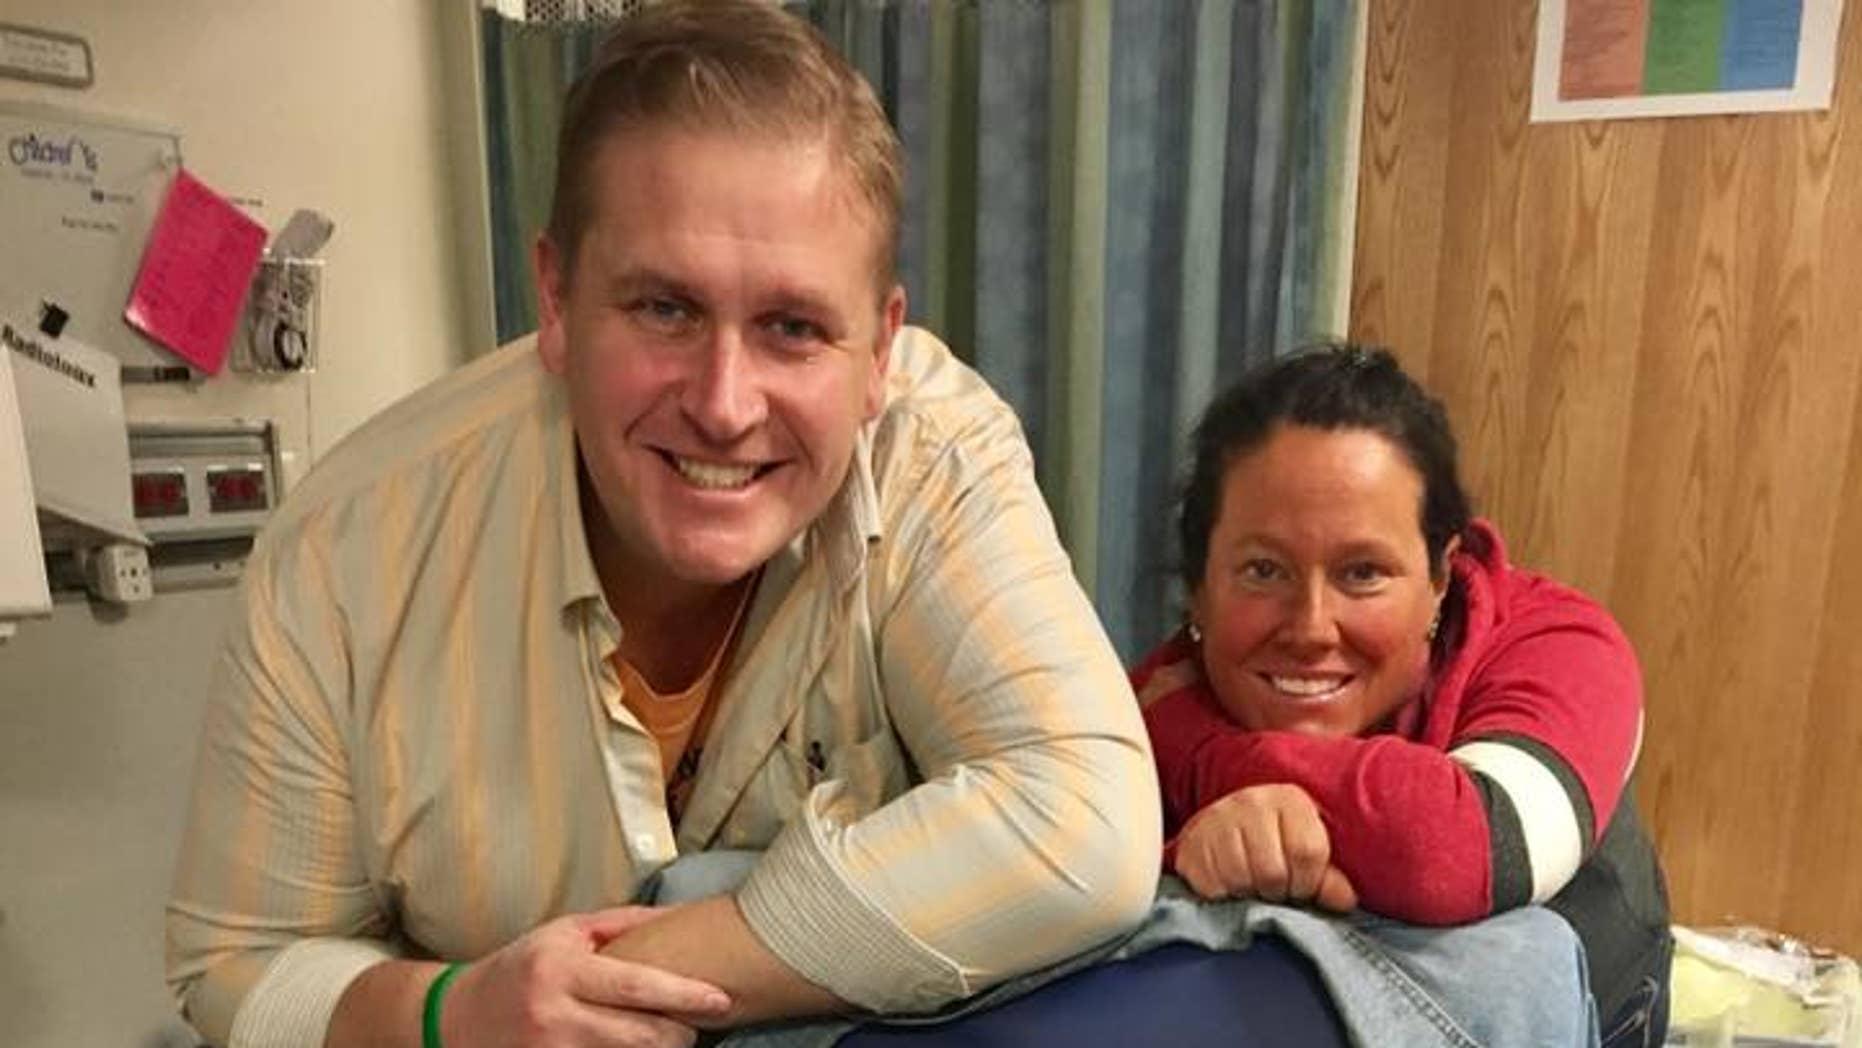 December 2016: Spencer with his dad Ken Kolman and his mom Liz Kolman at St. Louis Children's Hospital after his transplant.